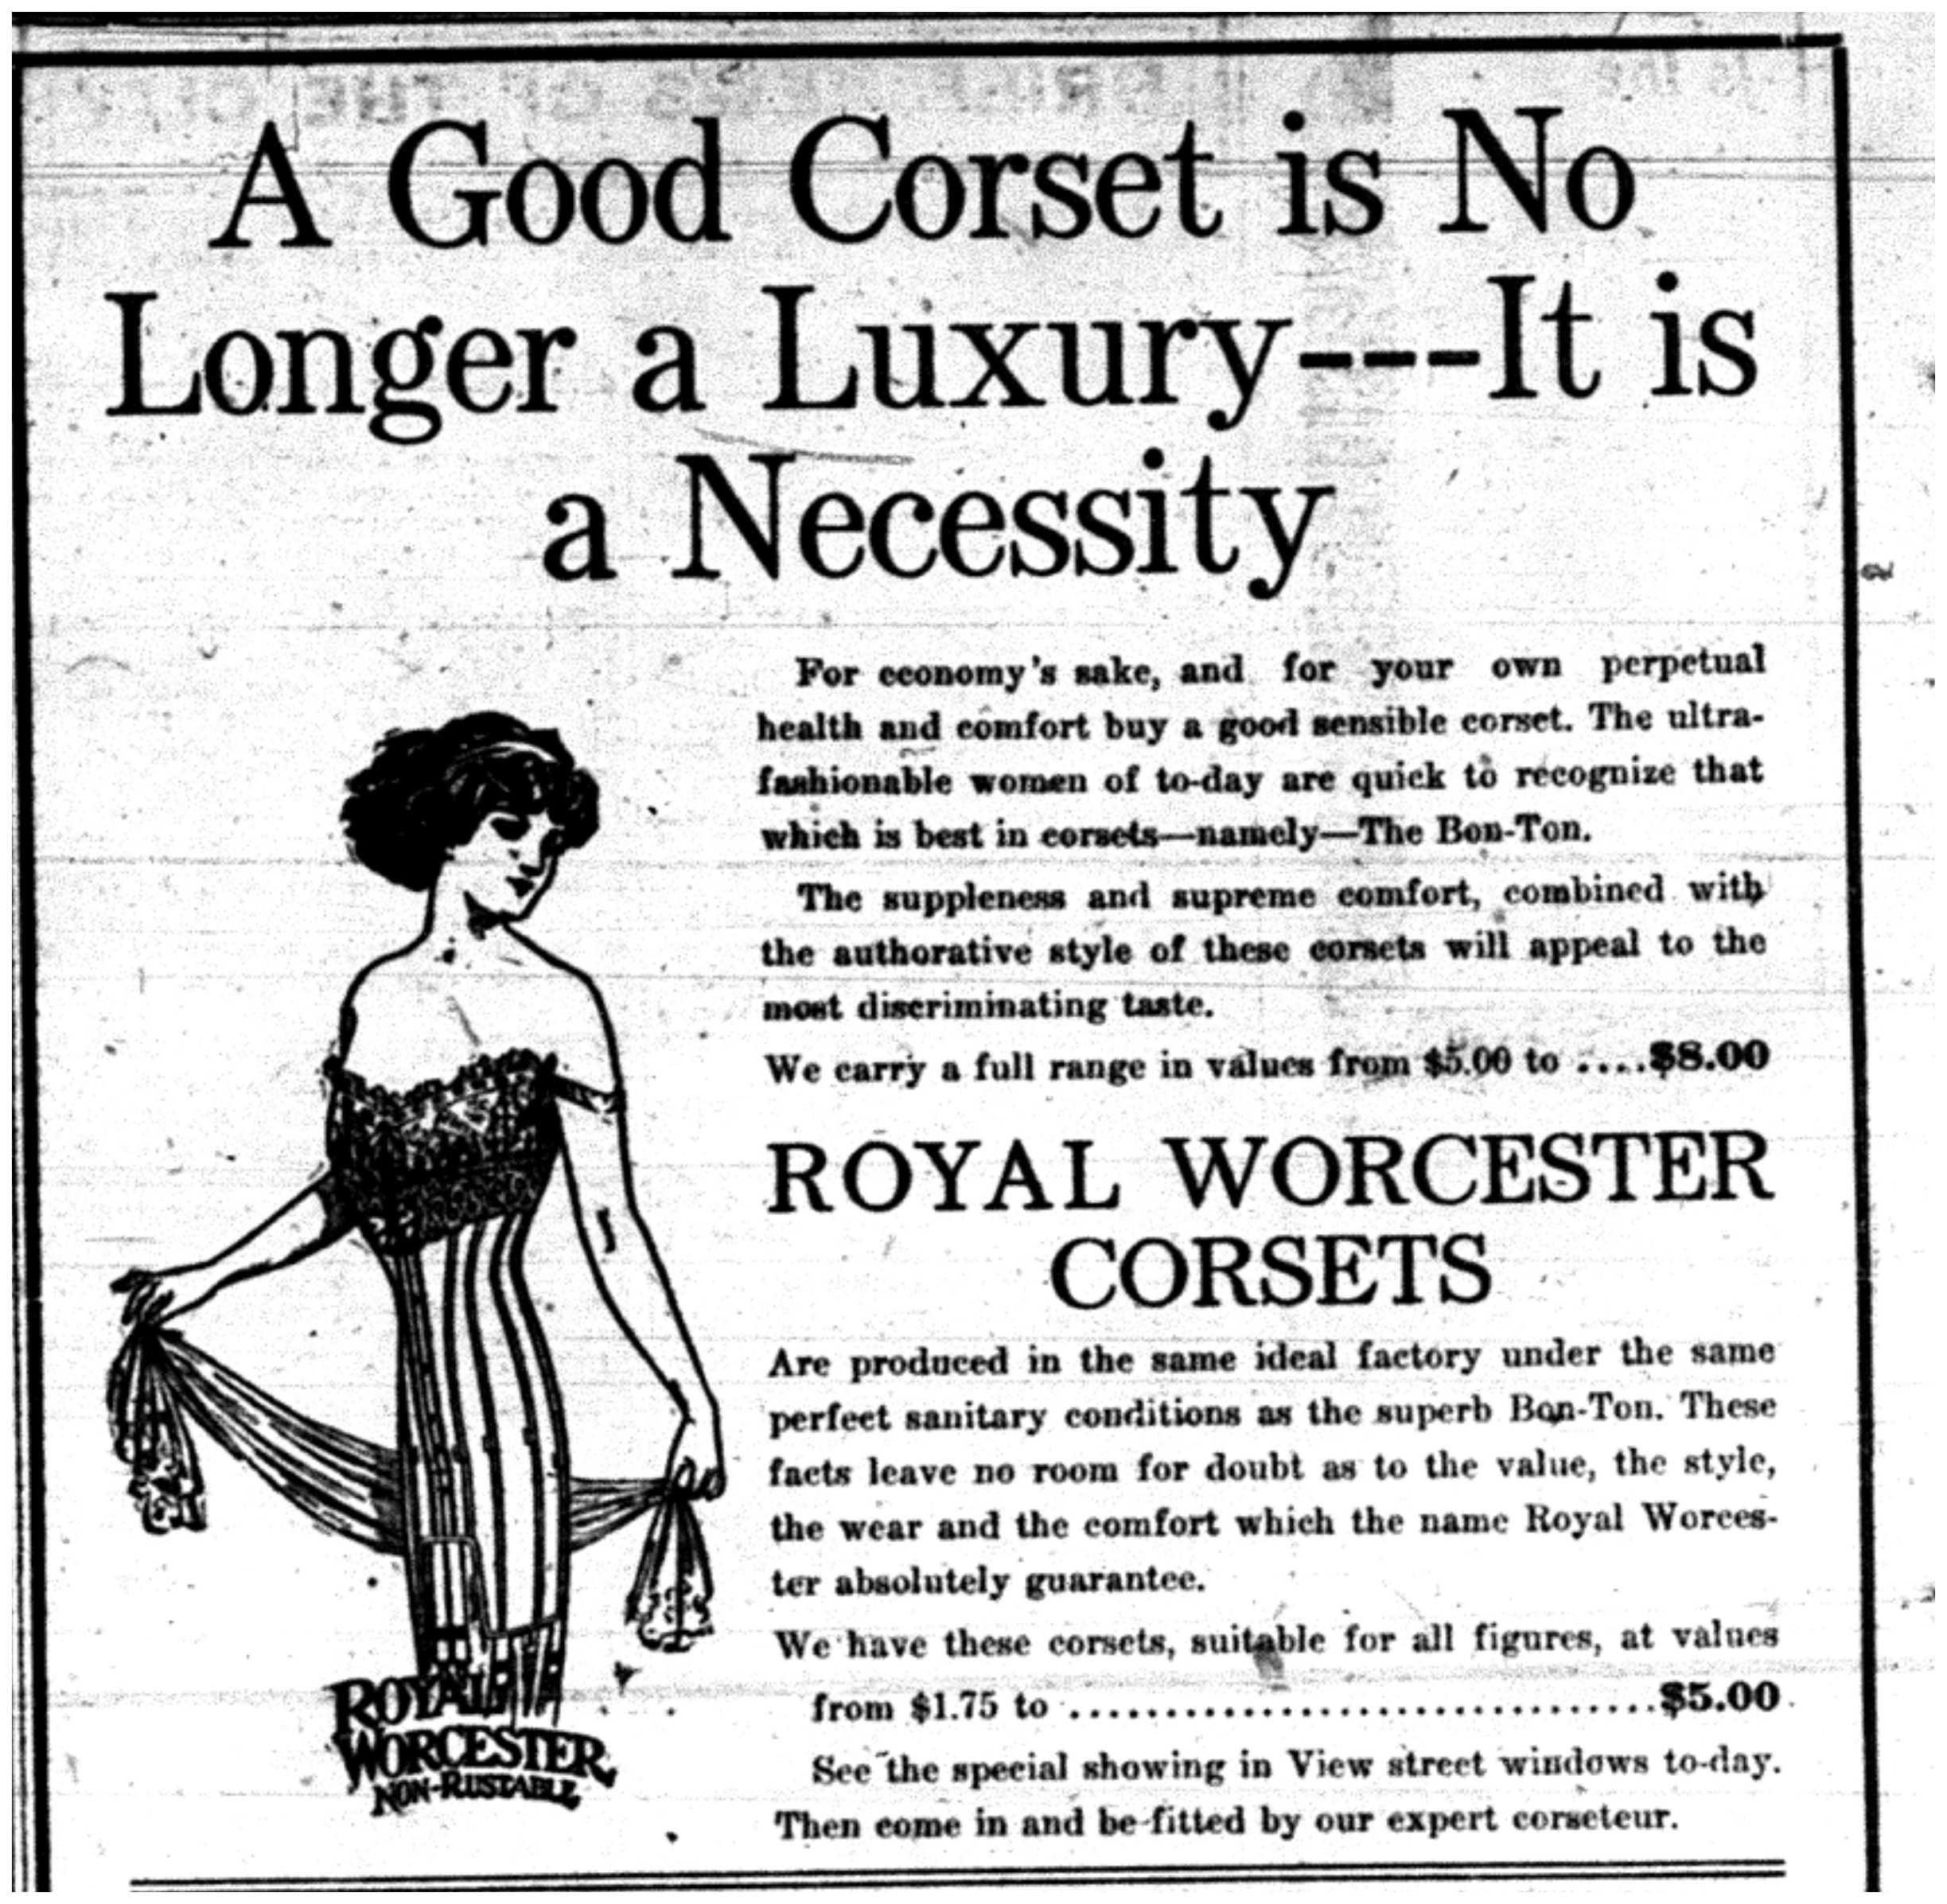 """A Good Corset is No Longer a Luxury - It's a Necessity"""